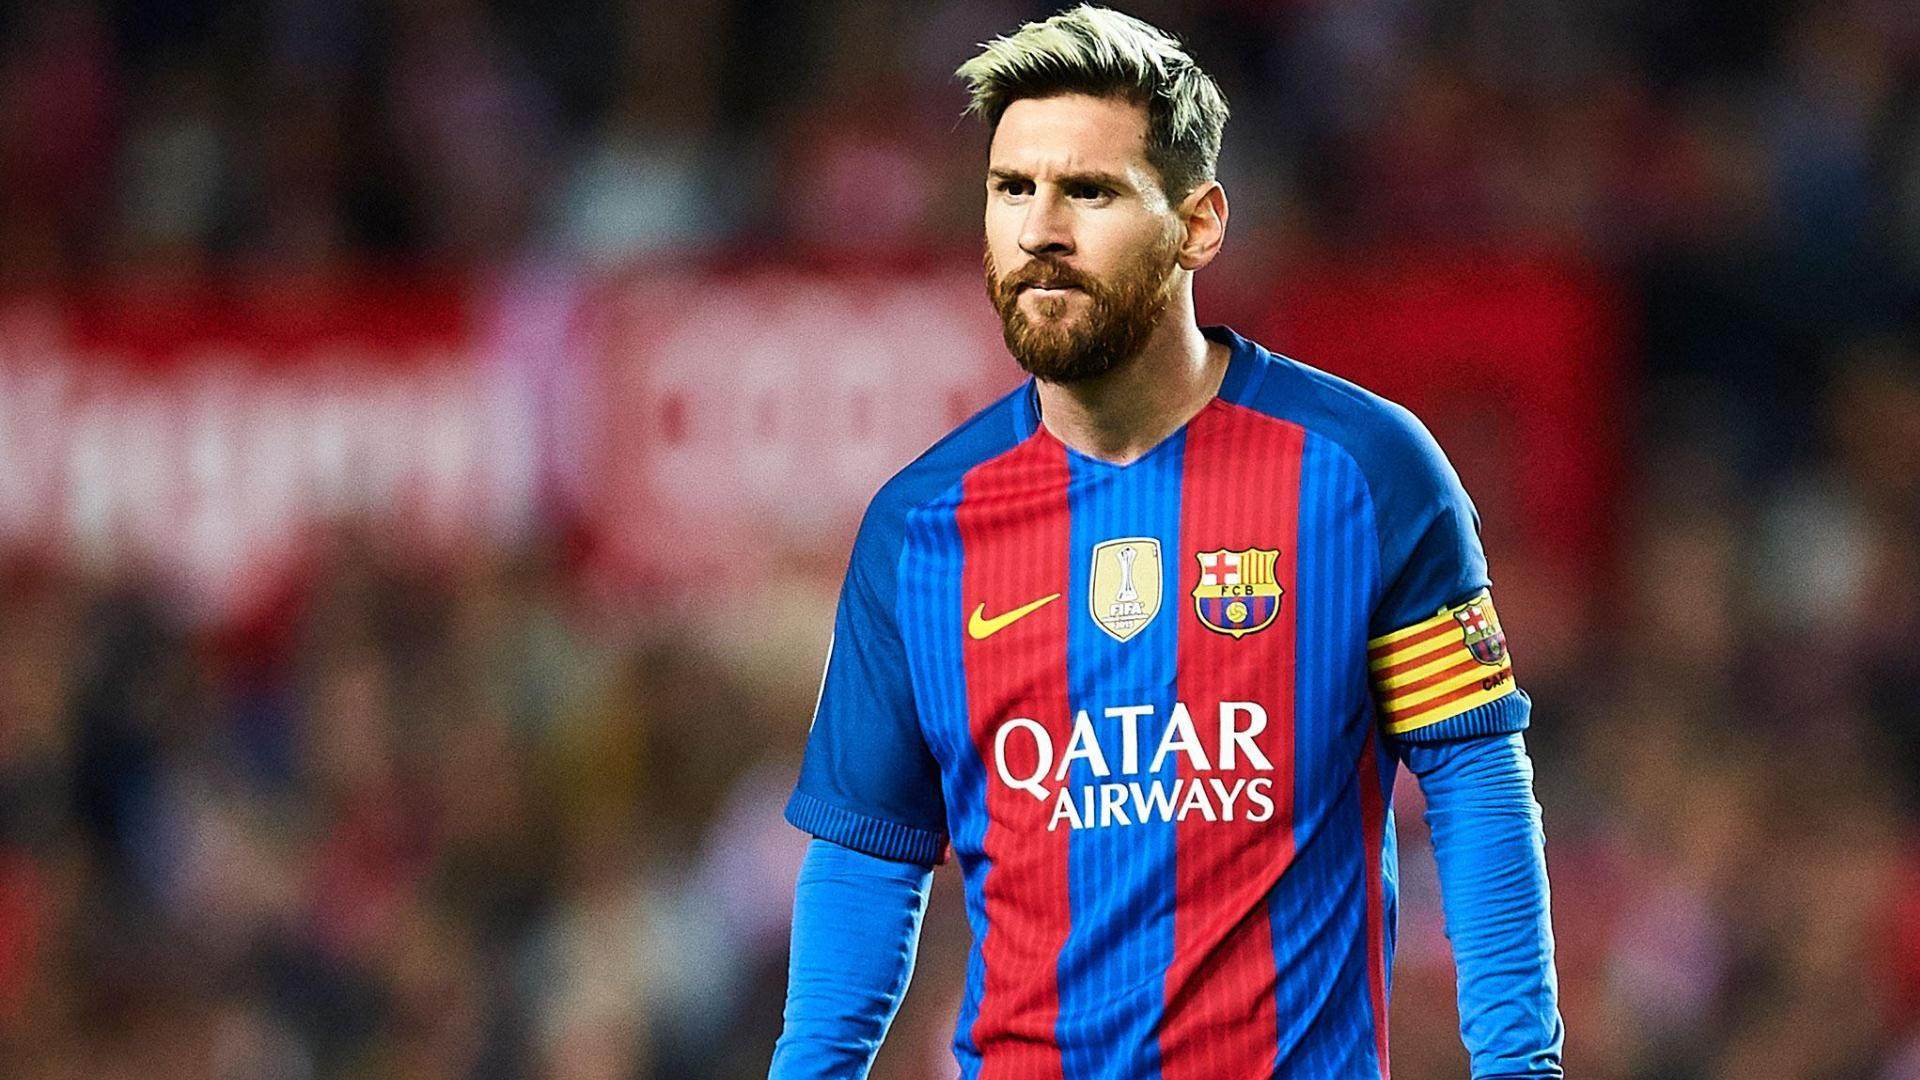 Messi Full HD Wallpapers - Wallpaper Cave